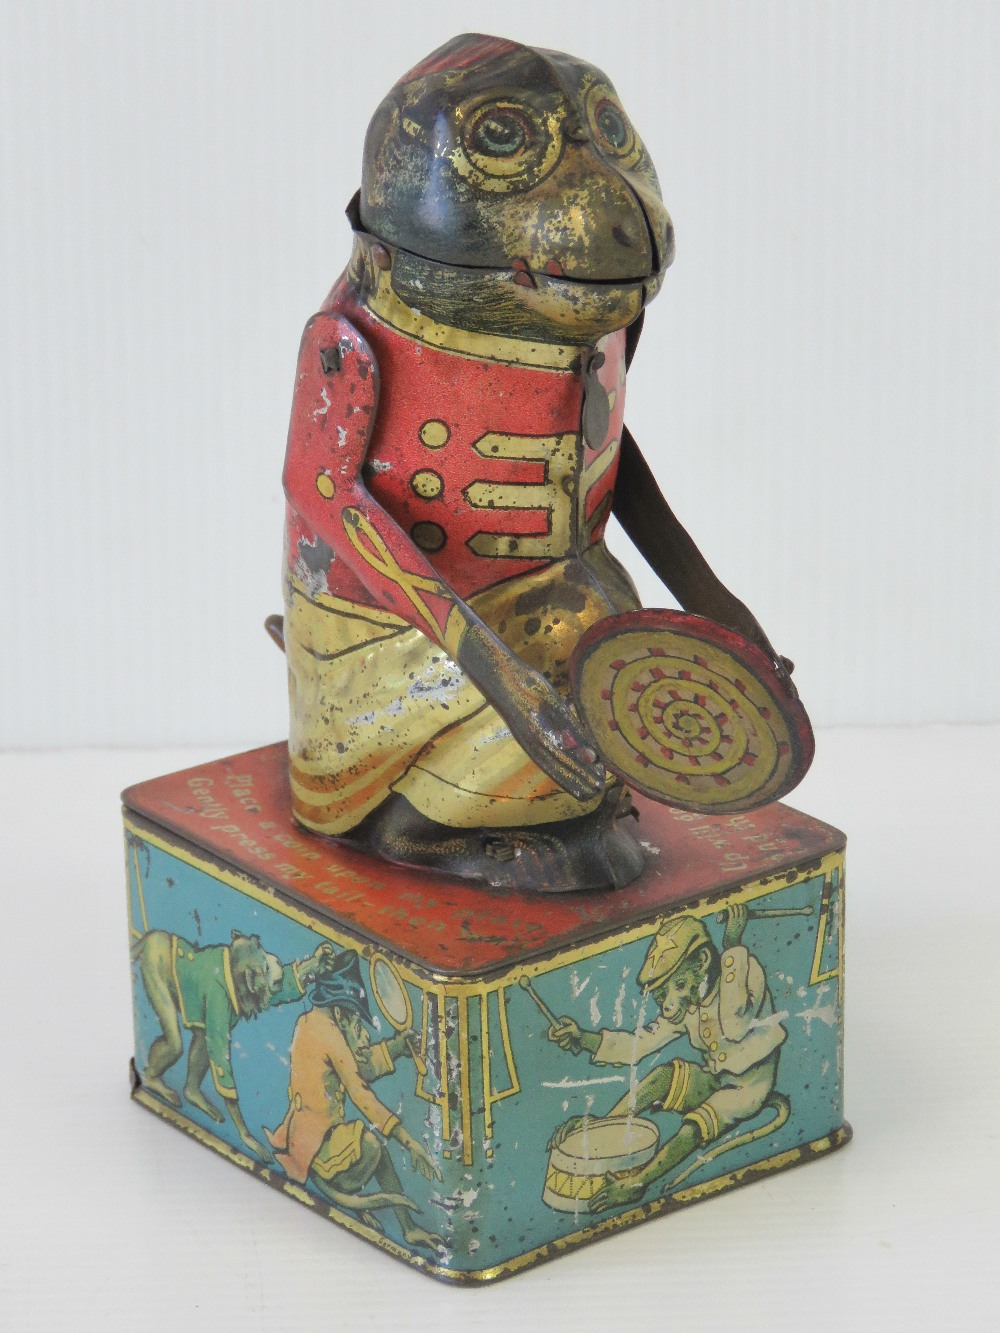 Lot 400 - A rare tin plate monkey money box with m